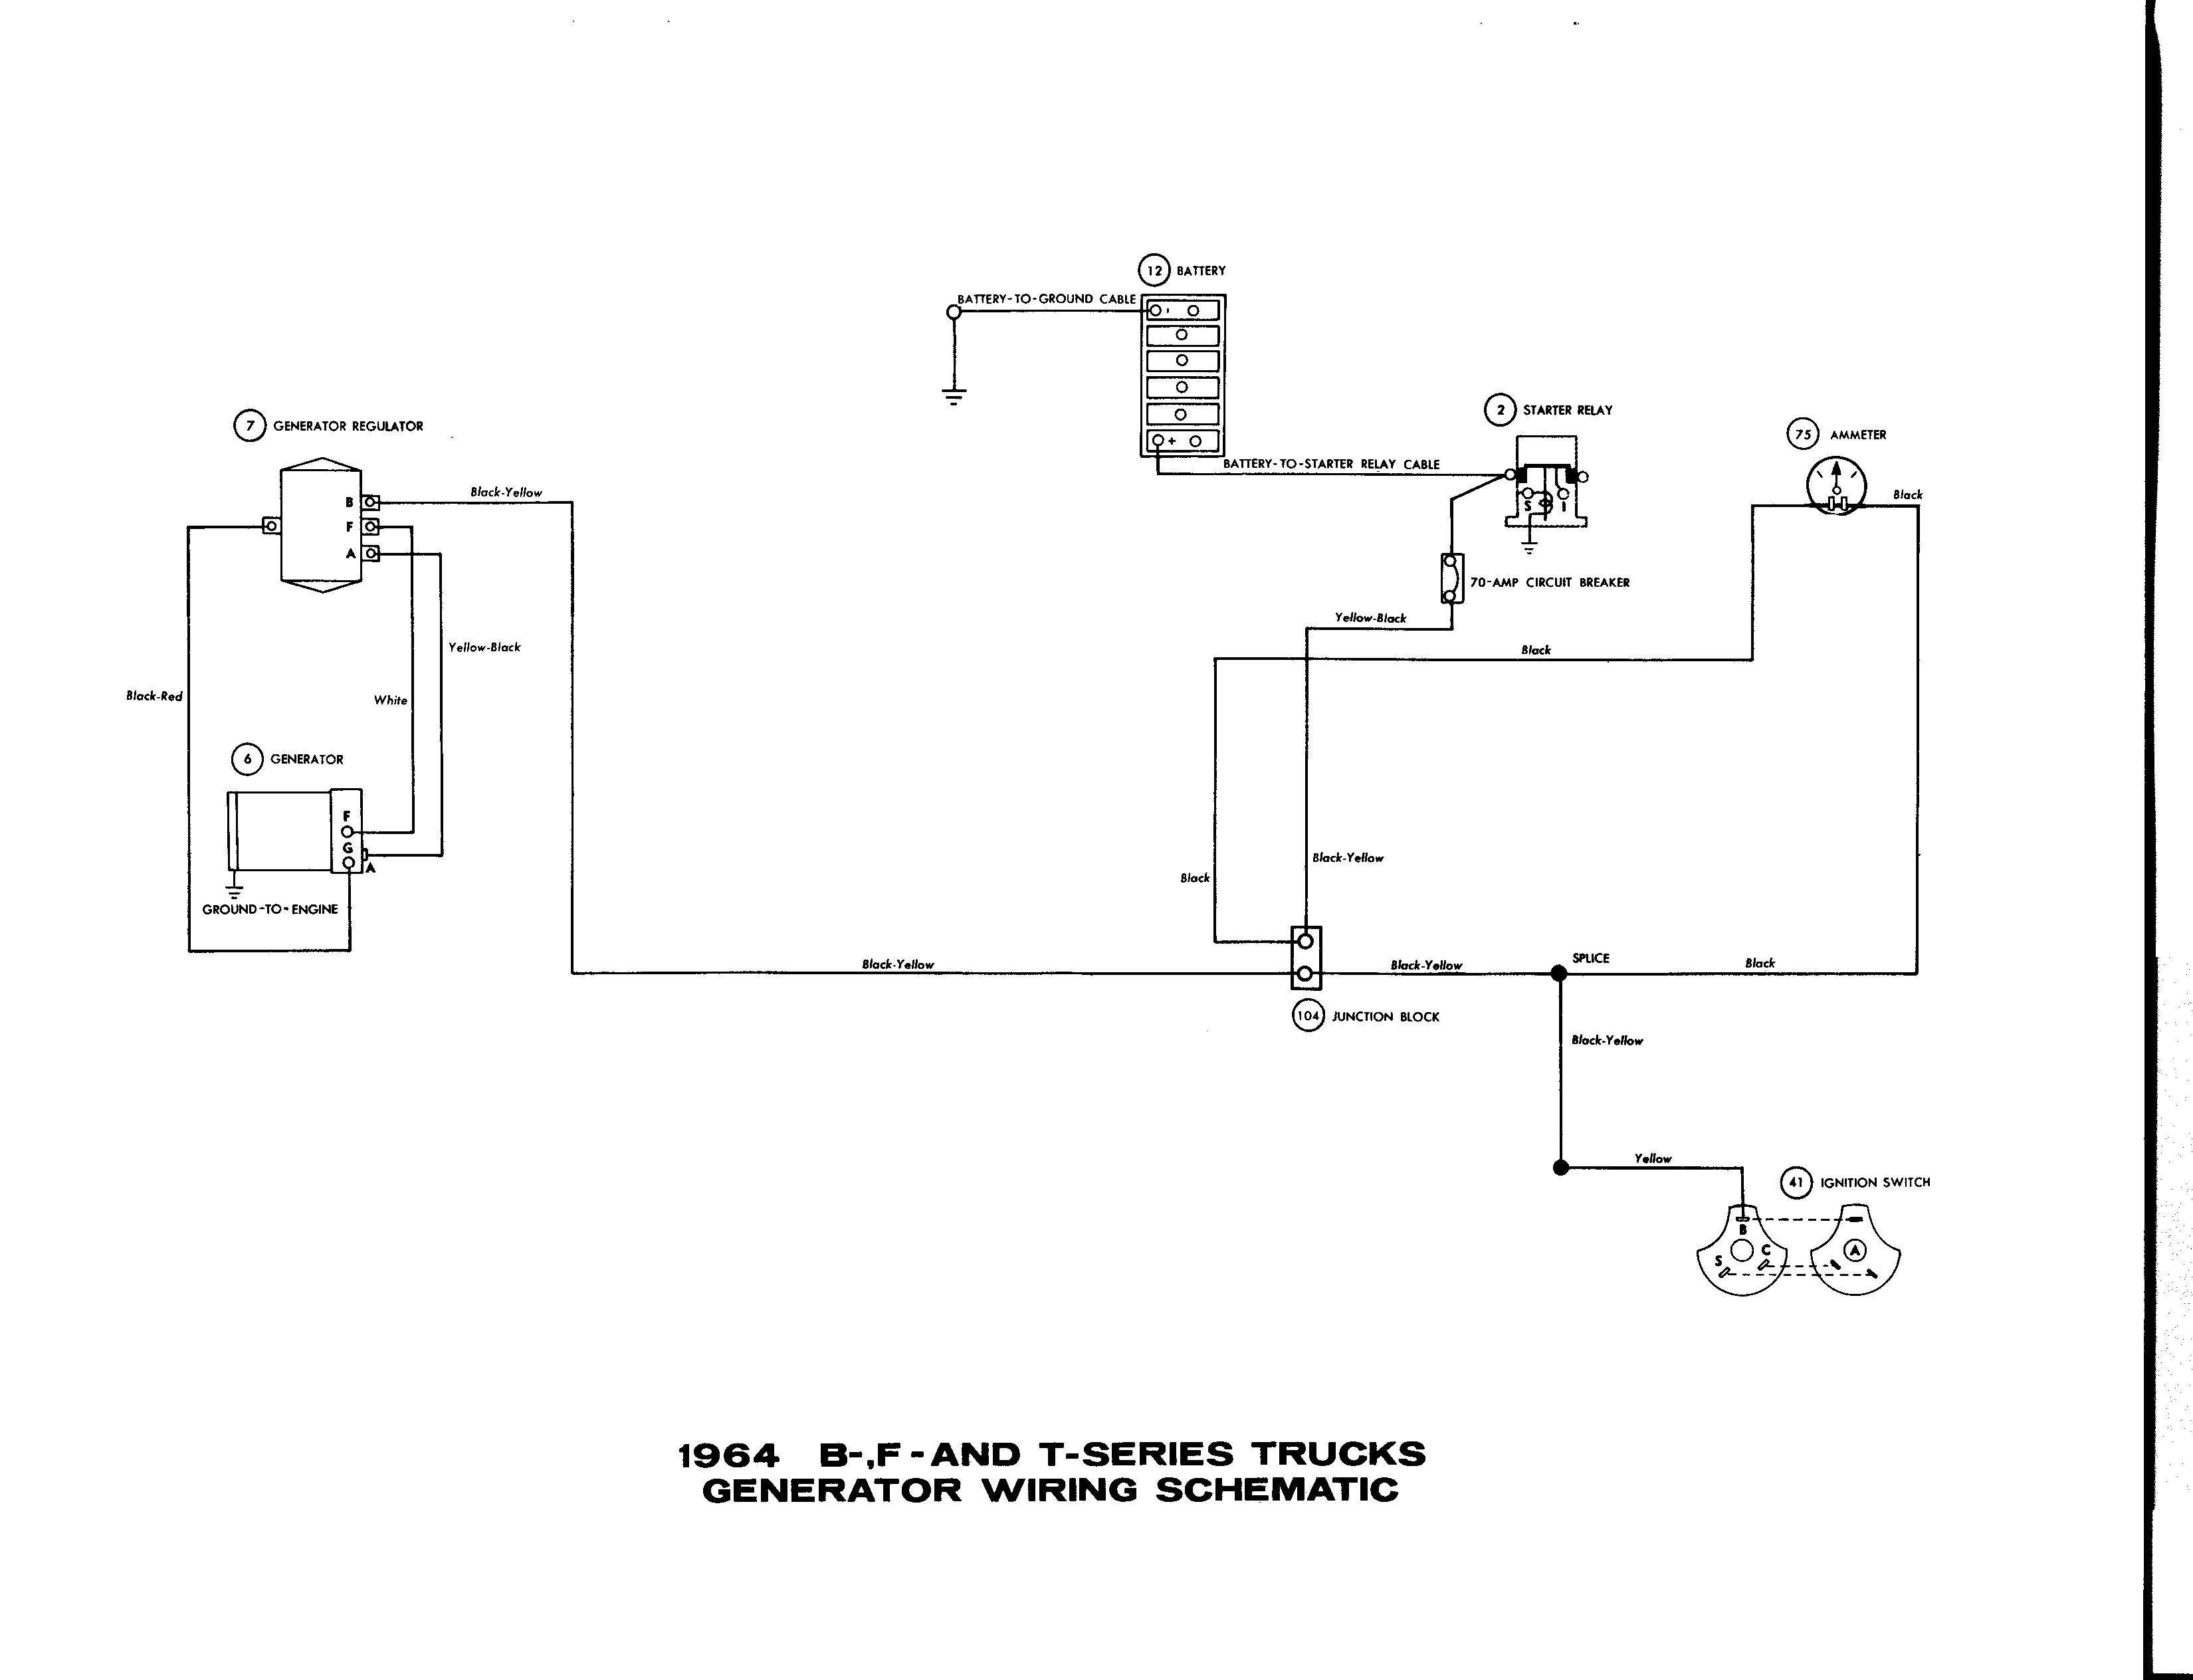 Diagrams Digramssample Diagramimages Wiringdiagramsample Wiringdiagram Check More At Https Nostoc Co Isuzu Alternator Wiring Dia Diagram Alternator Wire